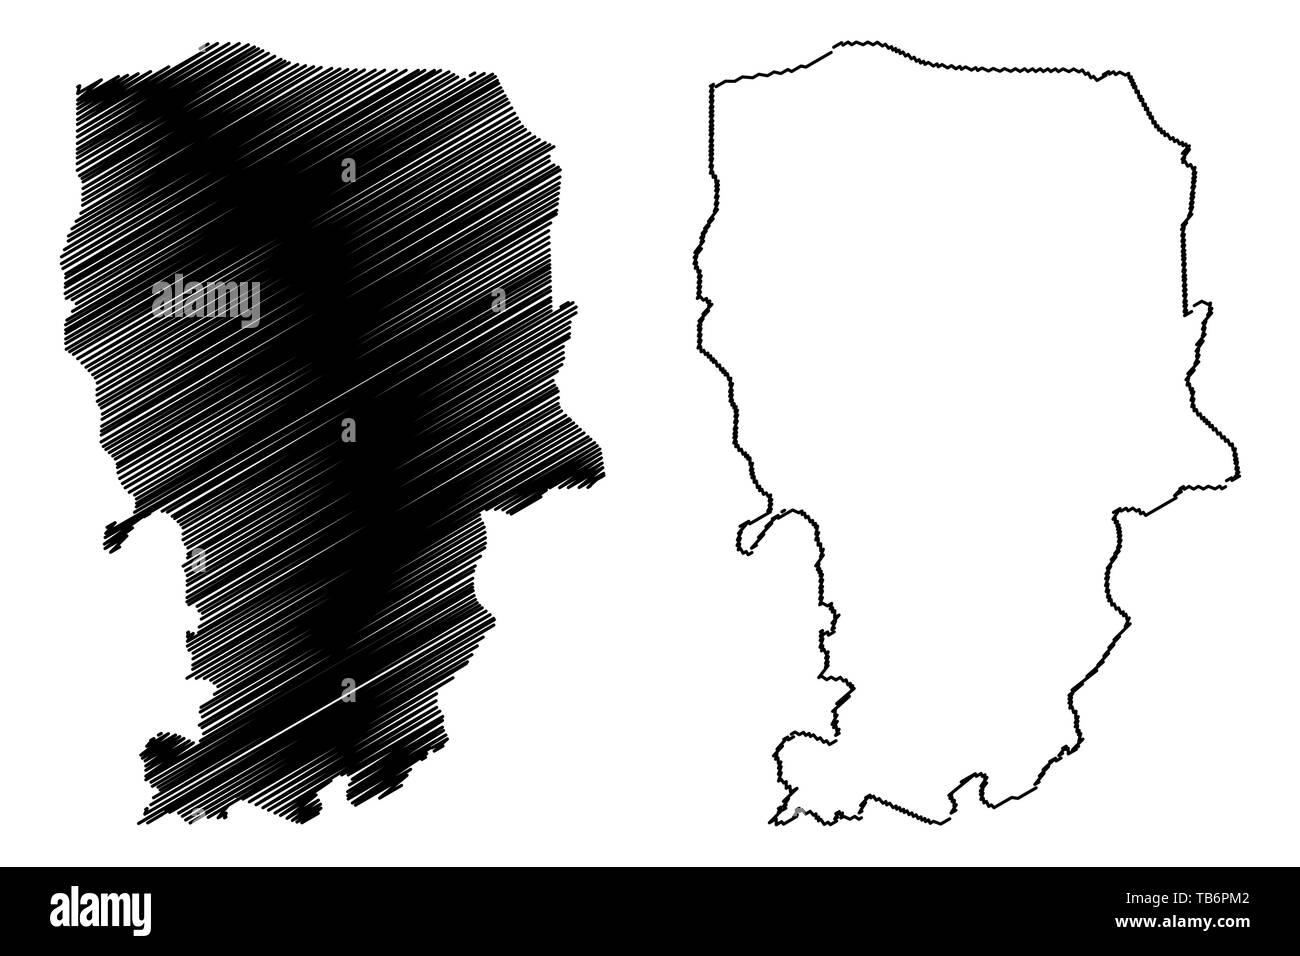 Amran Governorate (Governorates of Yemen, Republic of Yemen) map vector illustration, scribble sketch 'Amran map - Stock Vector